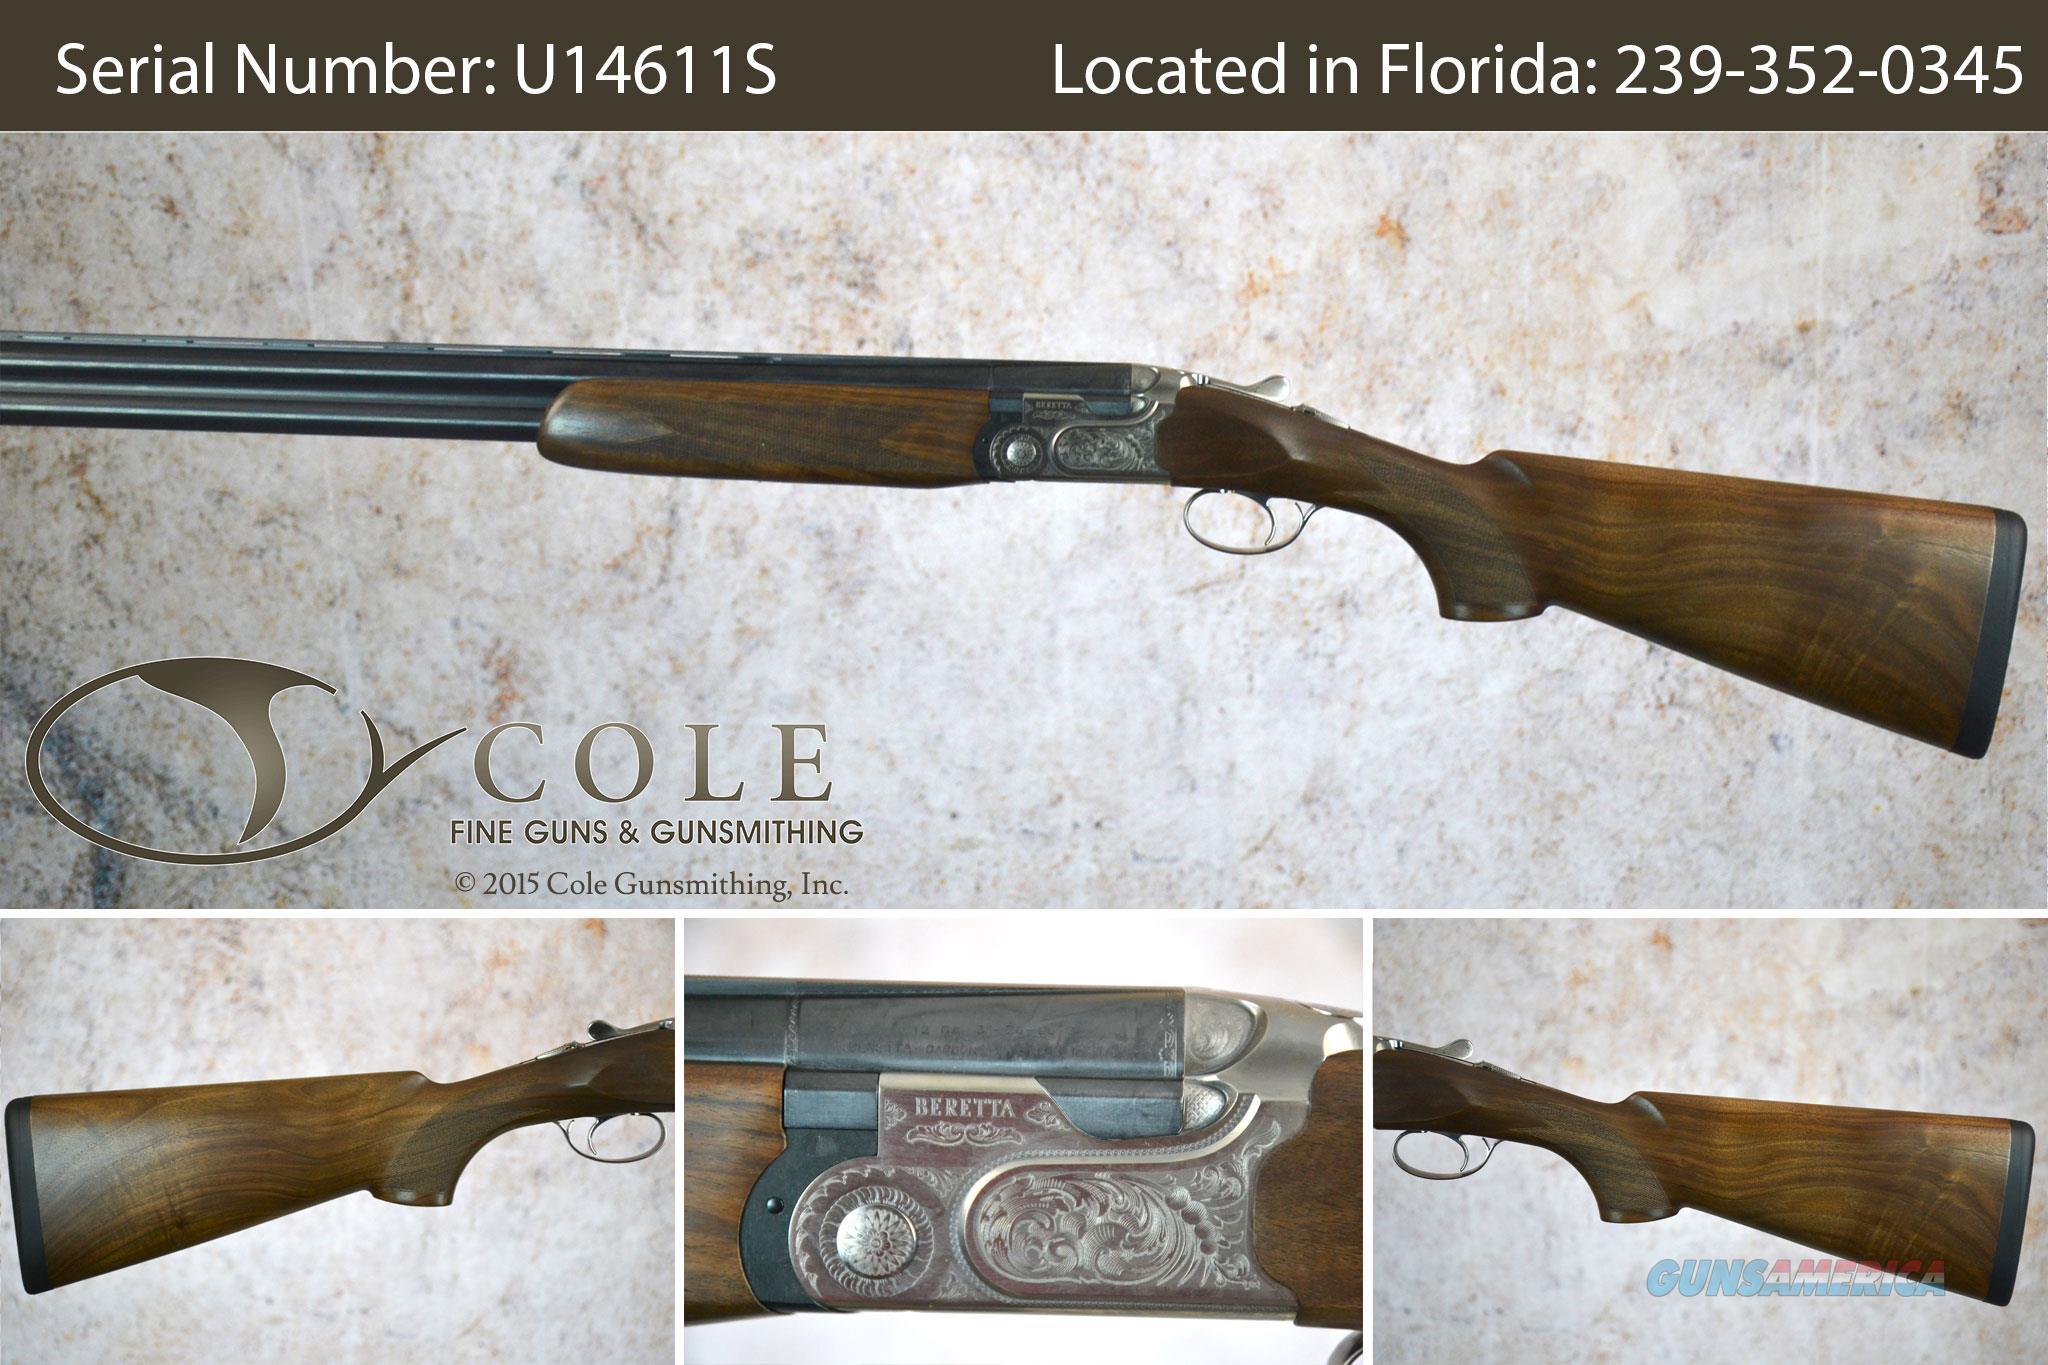 "Beretta 690 Field 12ga 28"" SN:U14611S  Guns > Shotguns > Beretta Shotguns > O/U > Hunting"